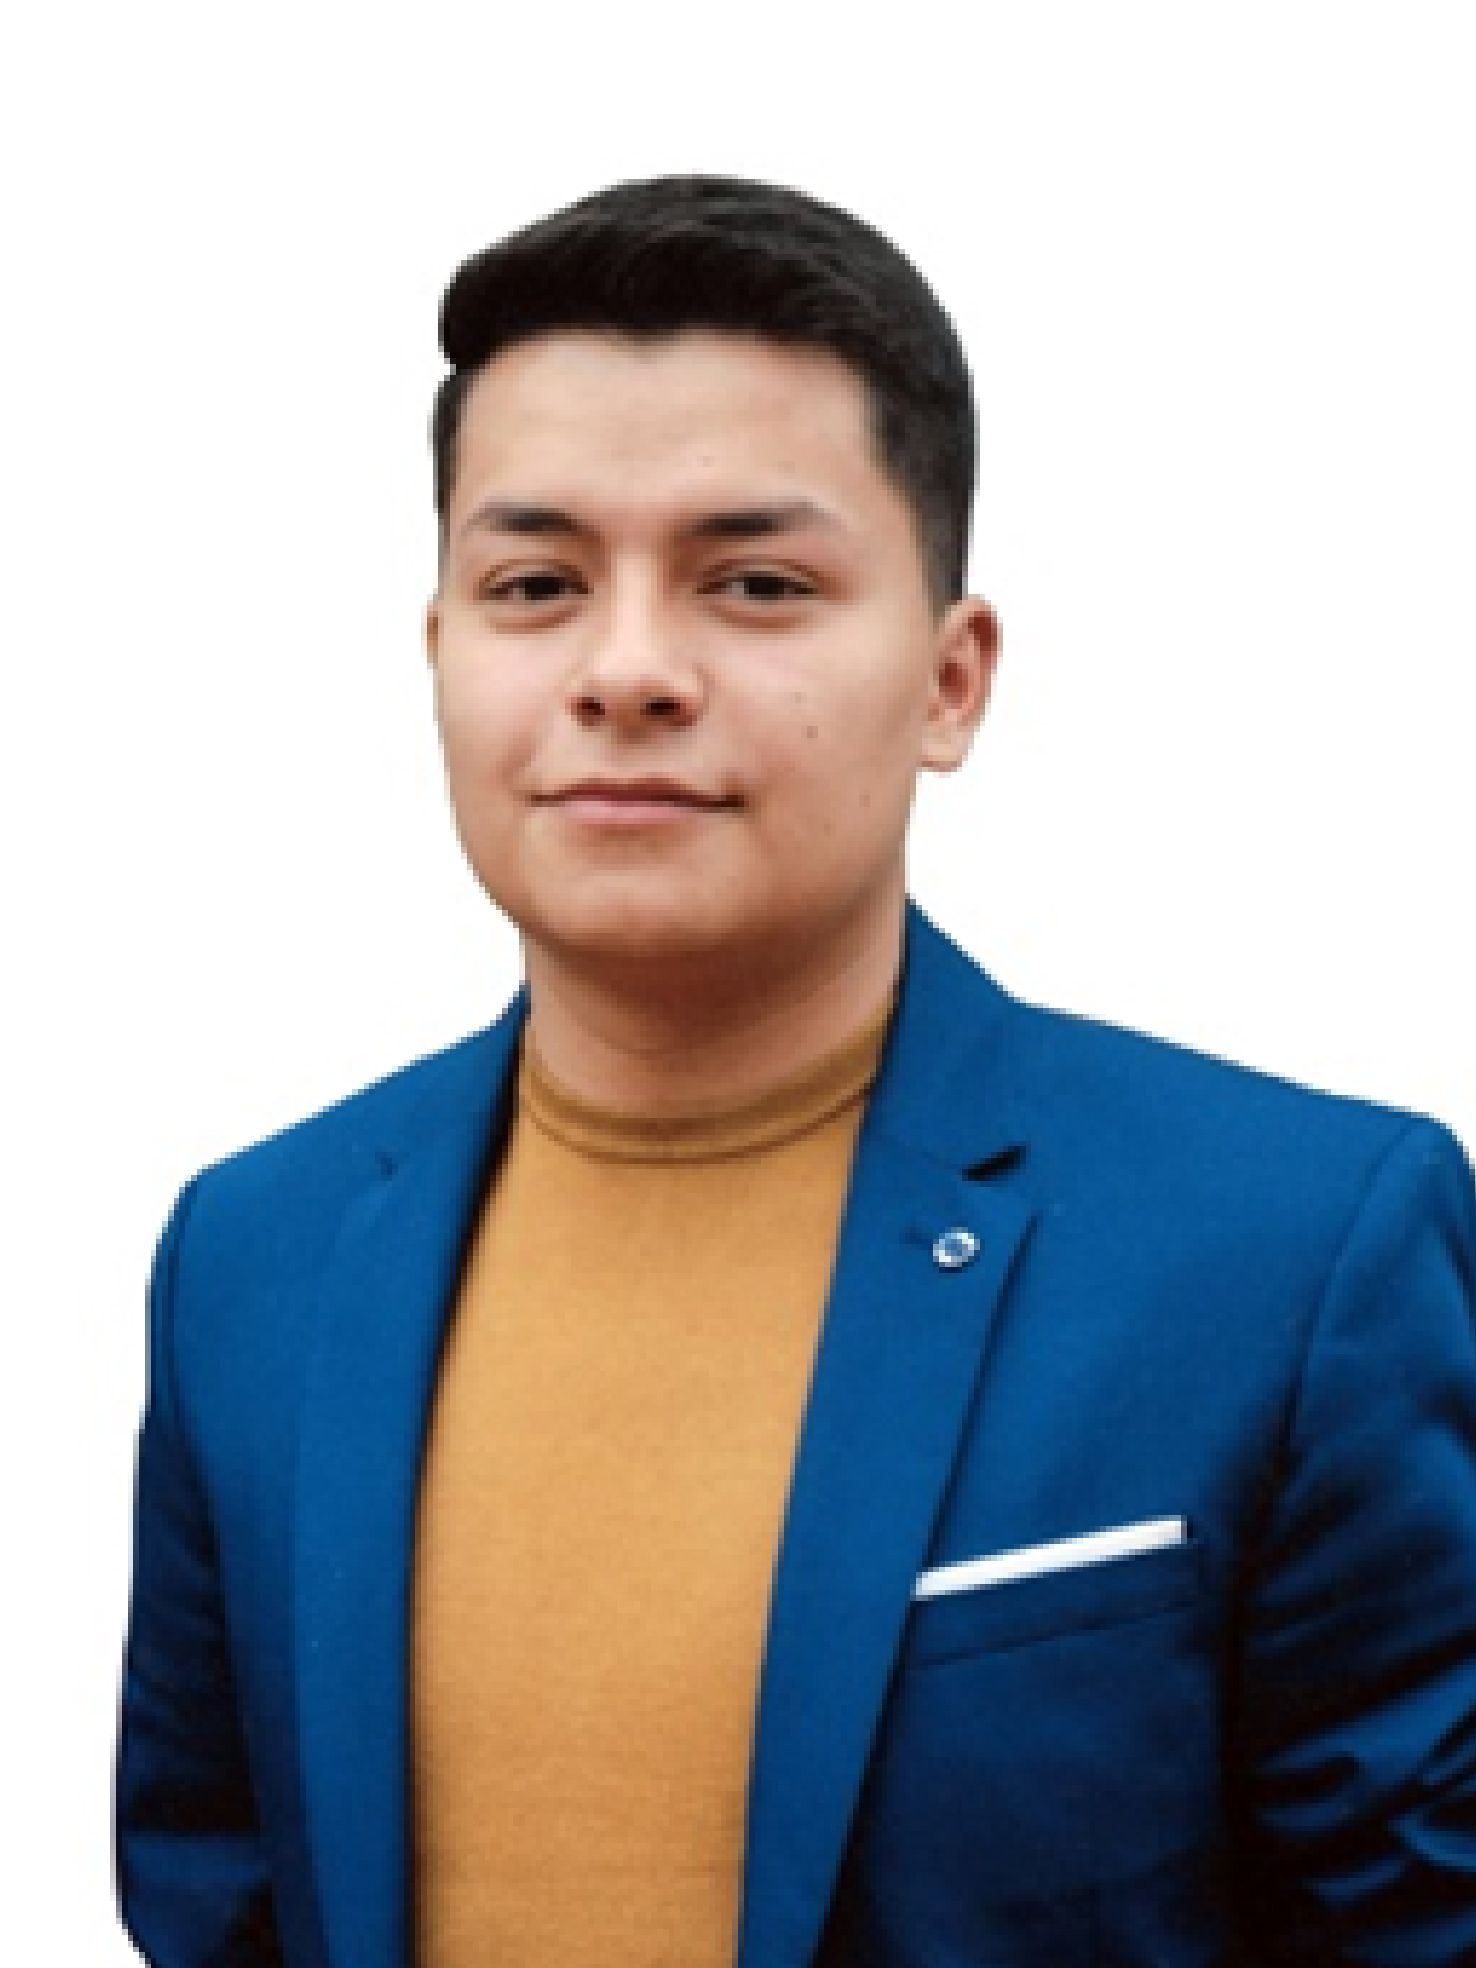 Julian Andres Castro